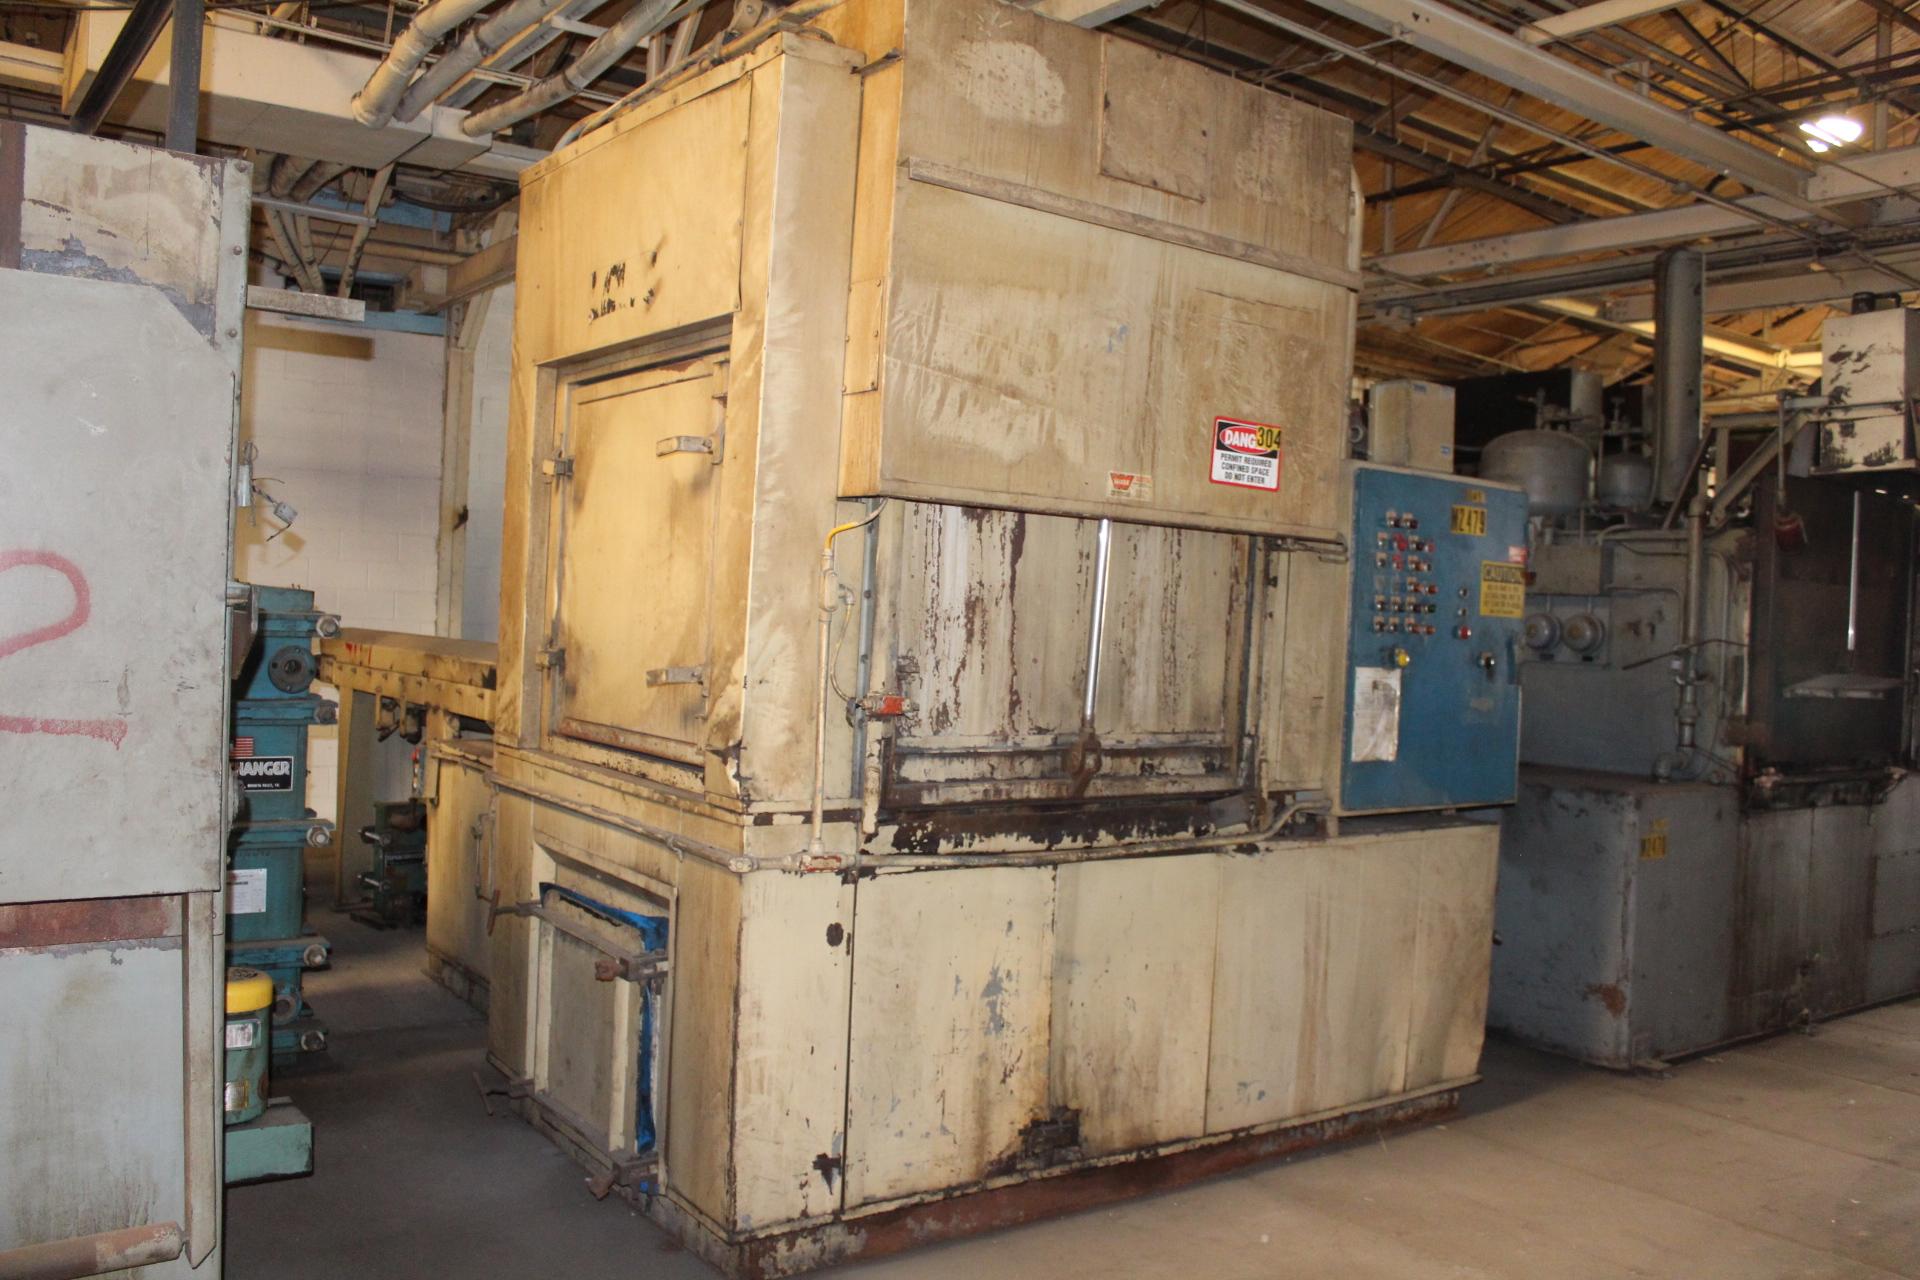 Lot 44 - Industrial Metal Fabricators Batch Type Parts Washer